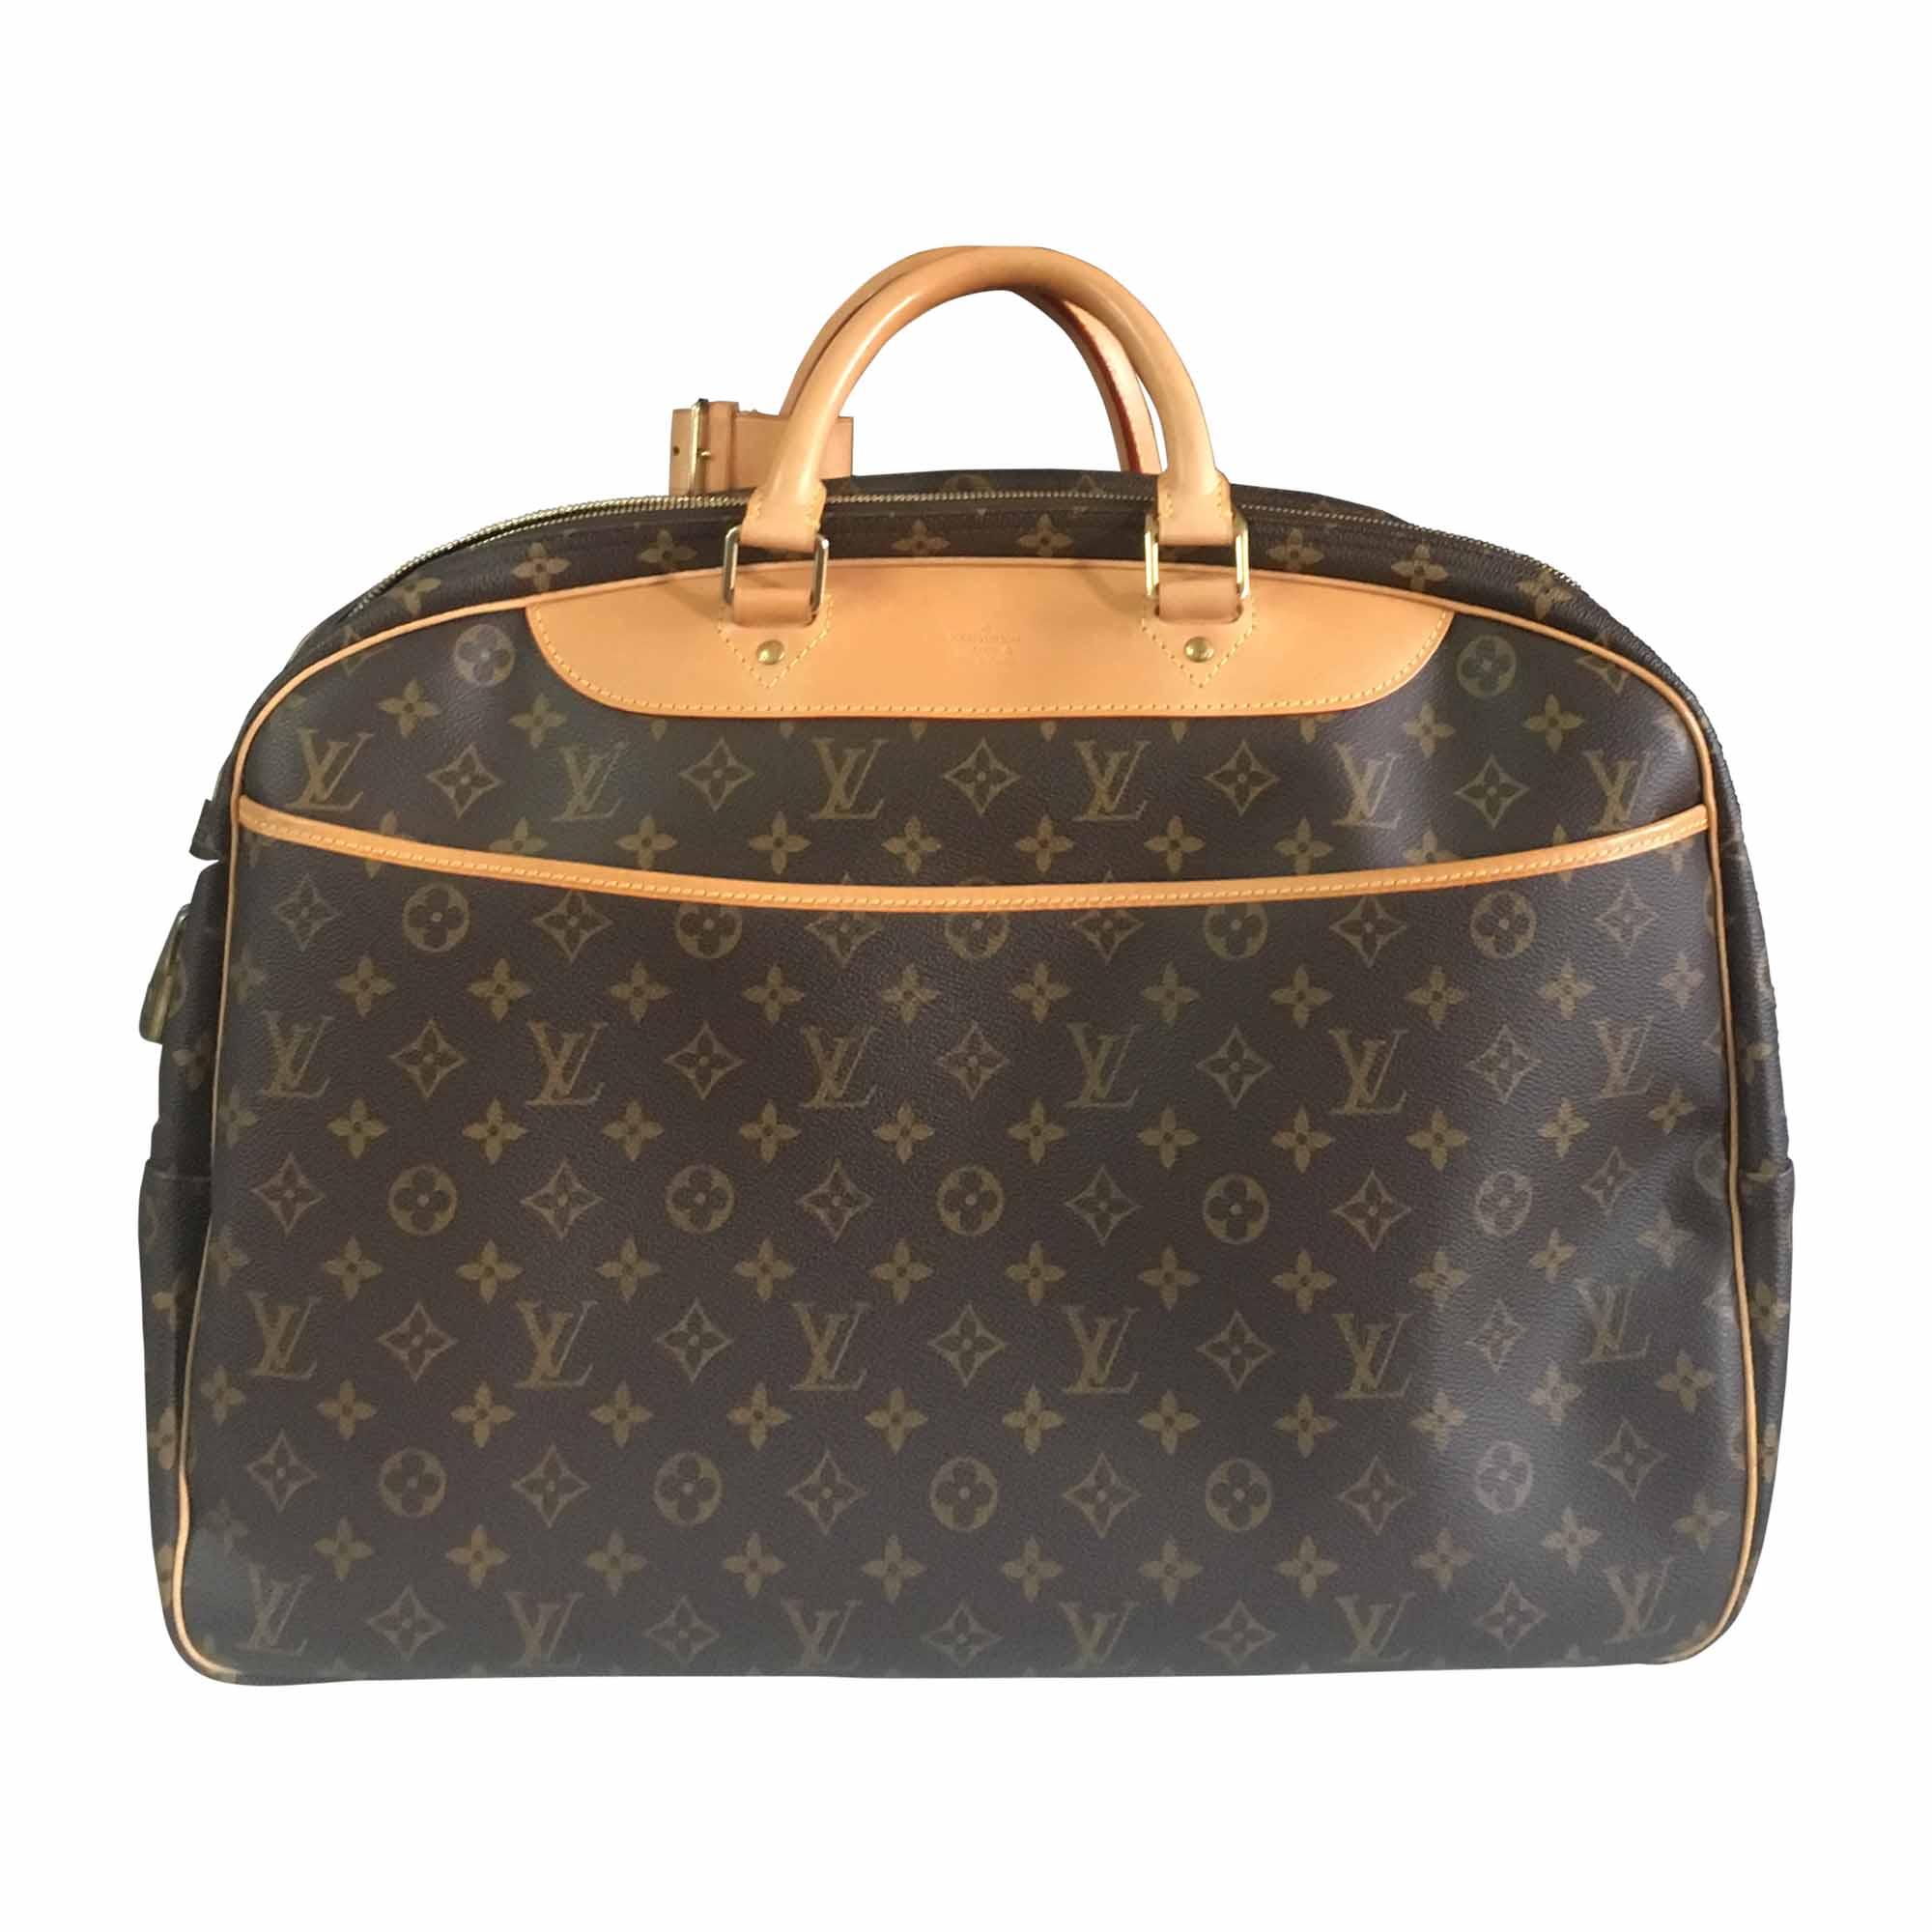 1f9808ef1e8e Sac XL en cuir LOUIS VUITTON marron vendu par Jade sue590381 - 7434566